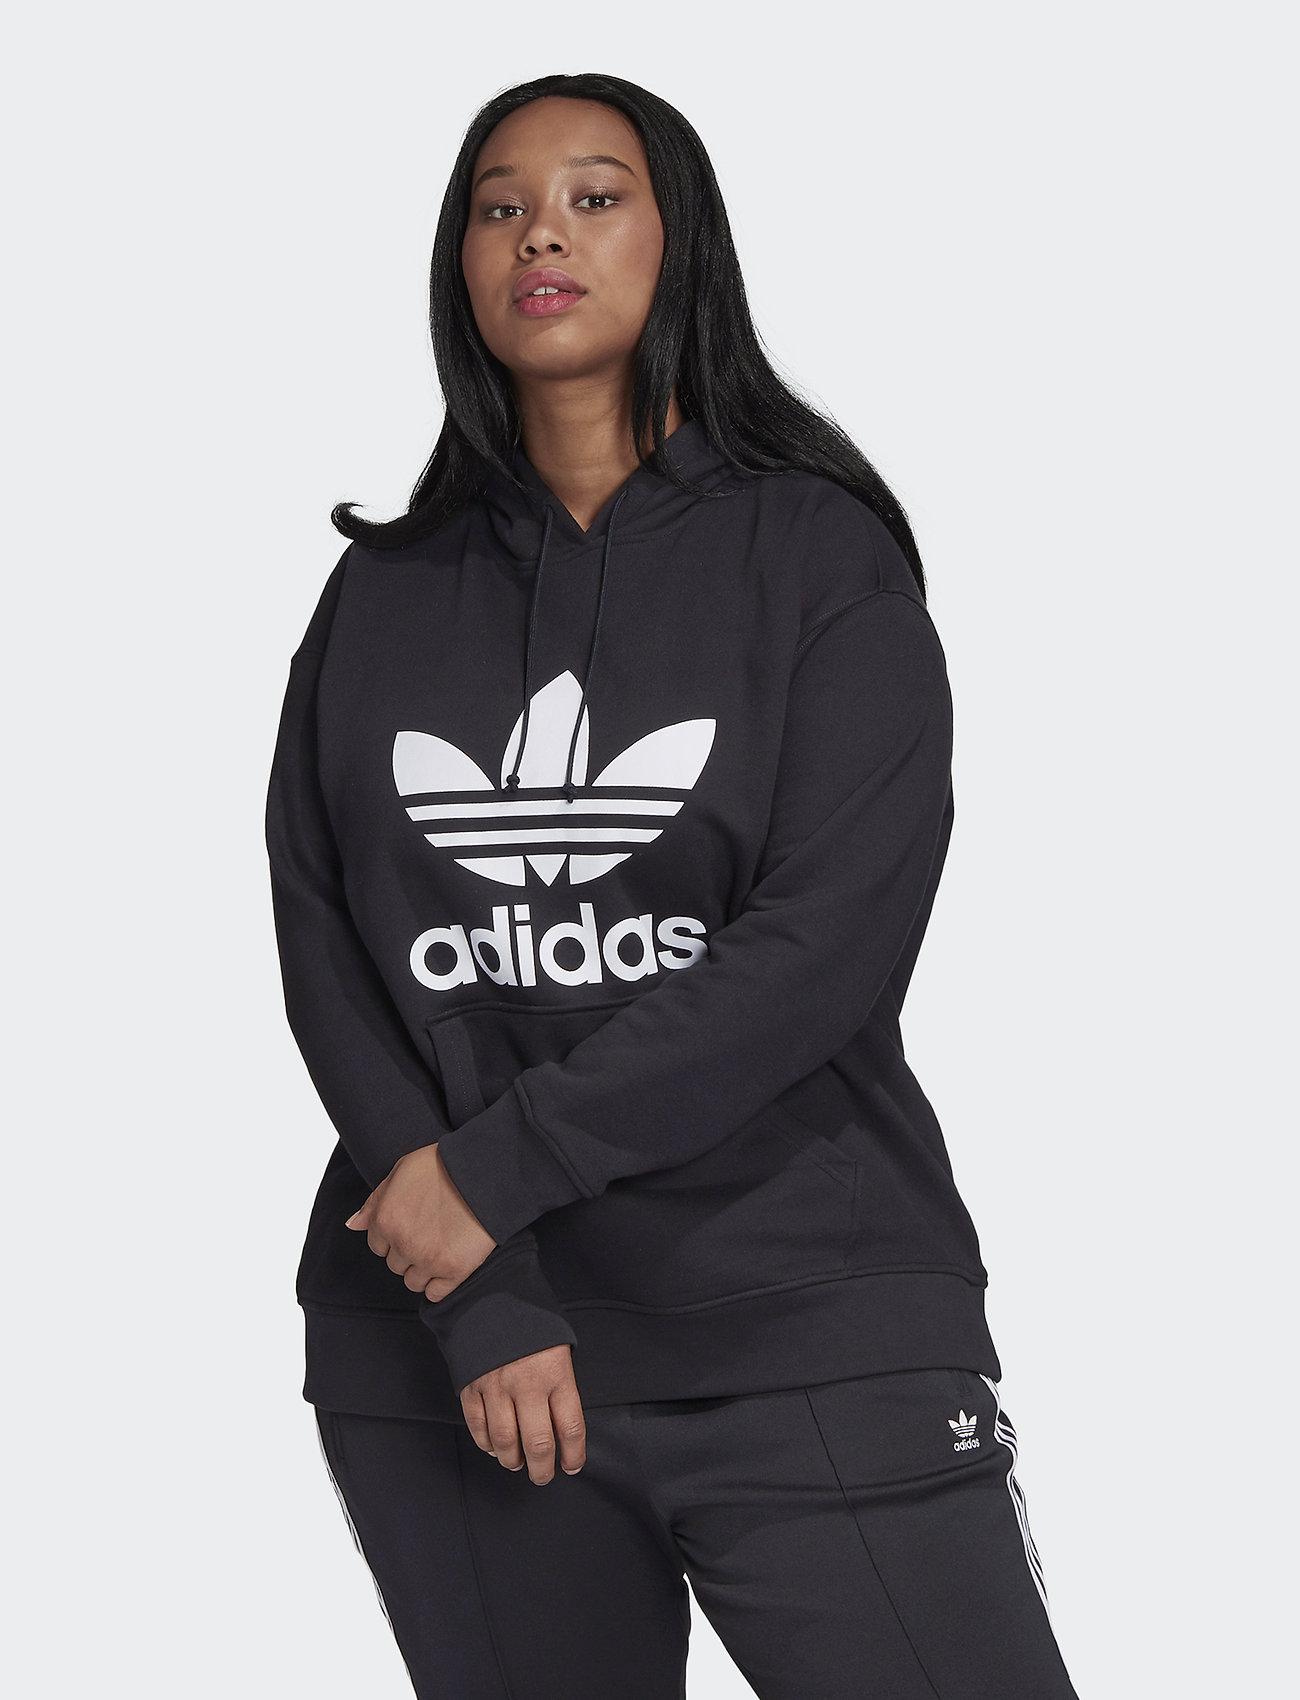 adidas Originals - TRF HOODIE - hupparit - black/white - 0